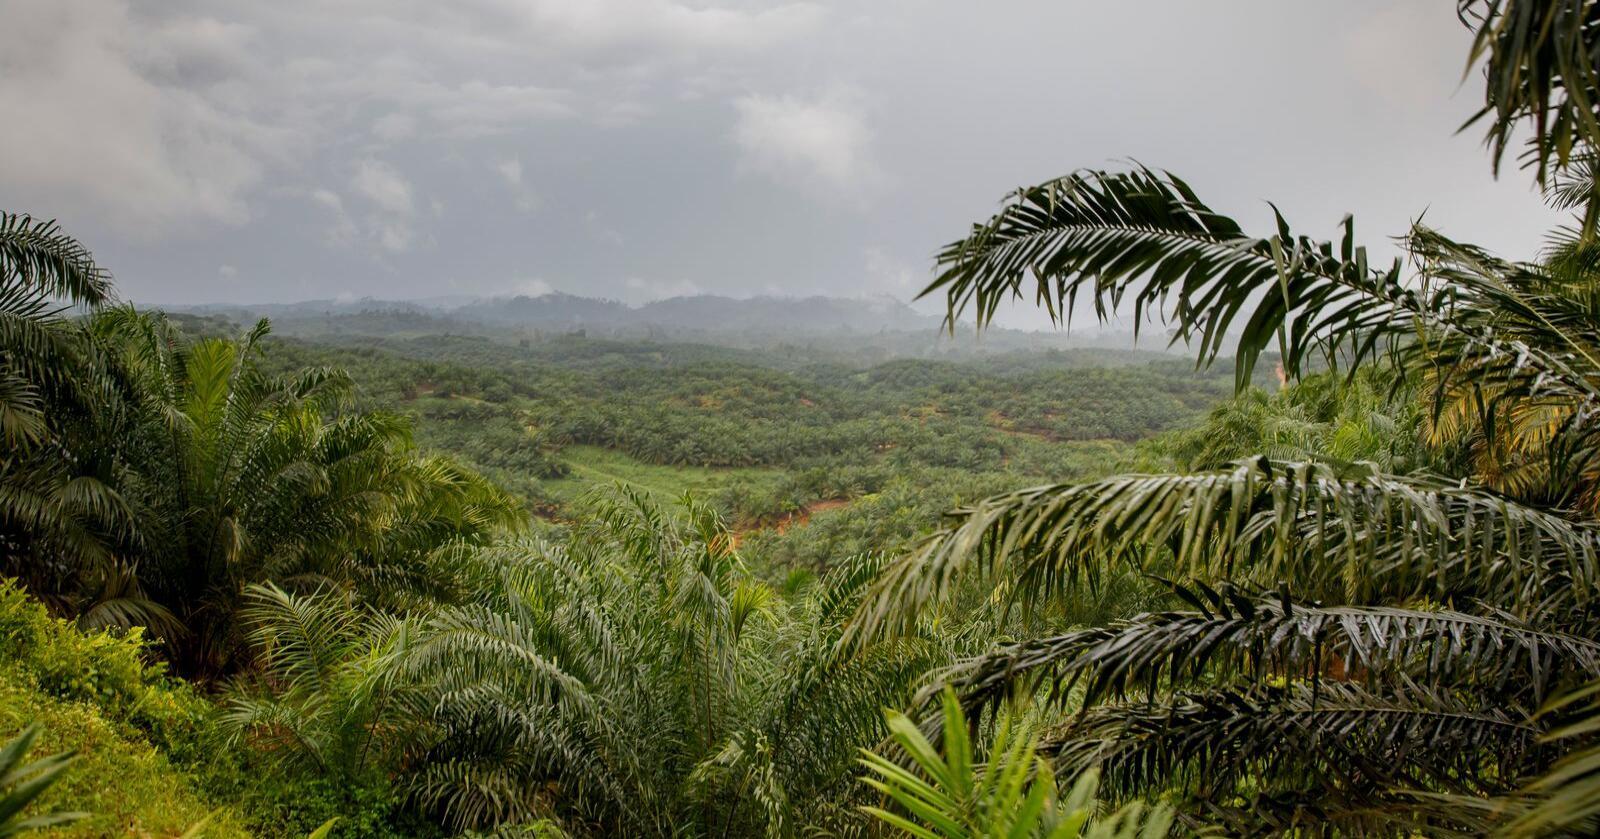 Sumatra i Indonesia er et av områdene i verden der regnskogen ødelegges i stort omfang. Arkivfoto: Foto: Heiko Junge / NTB